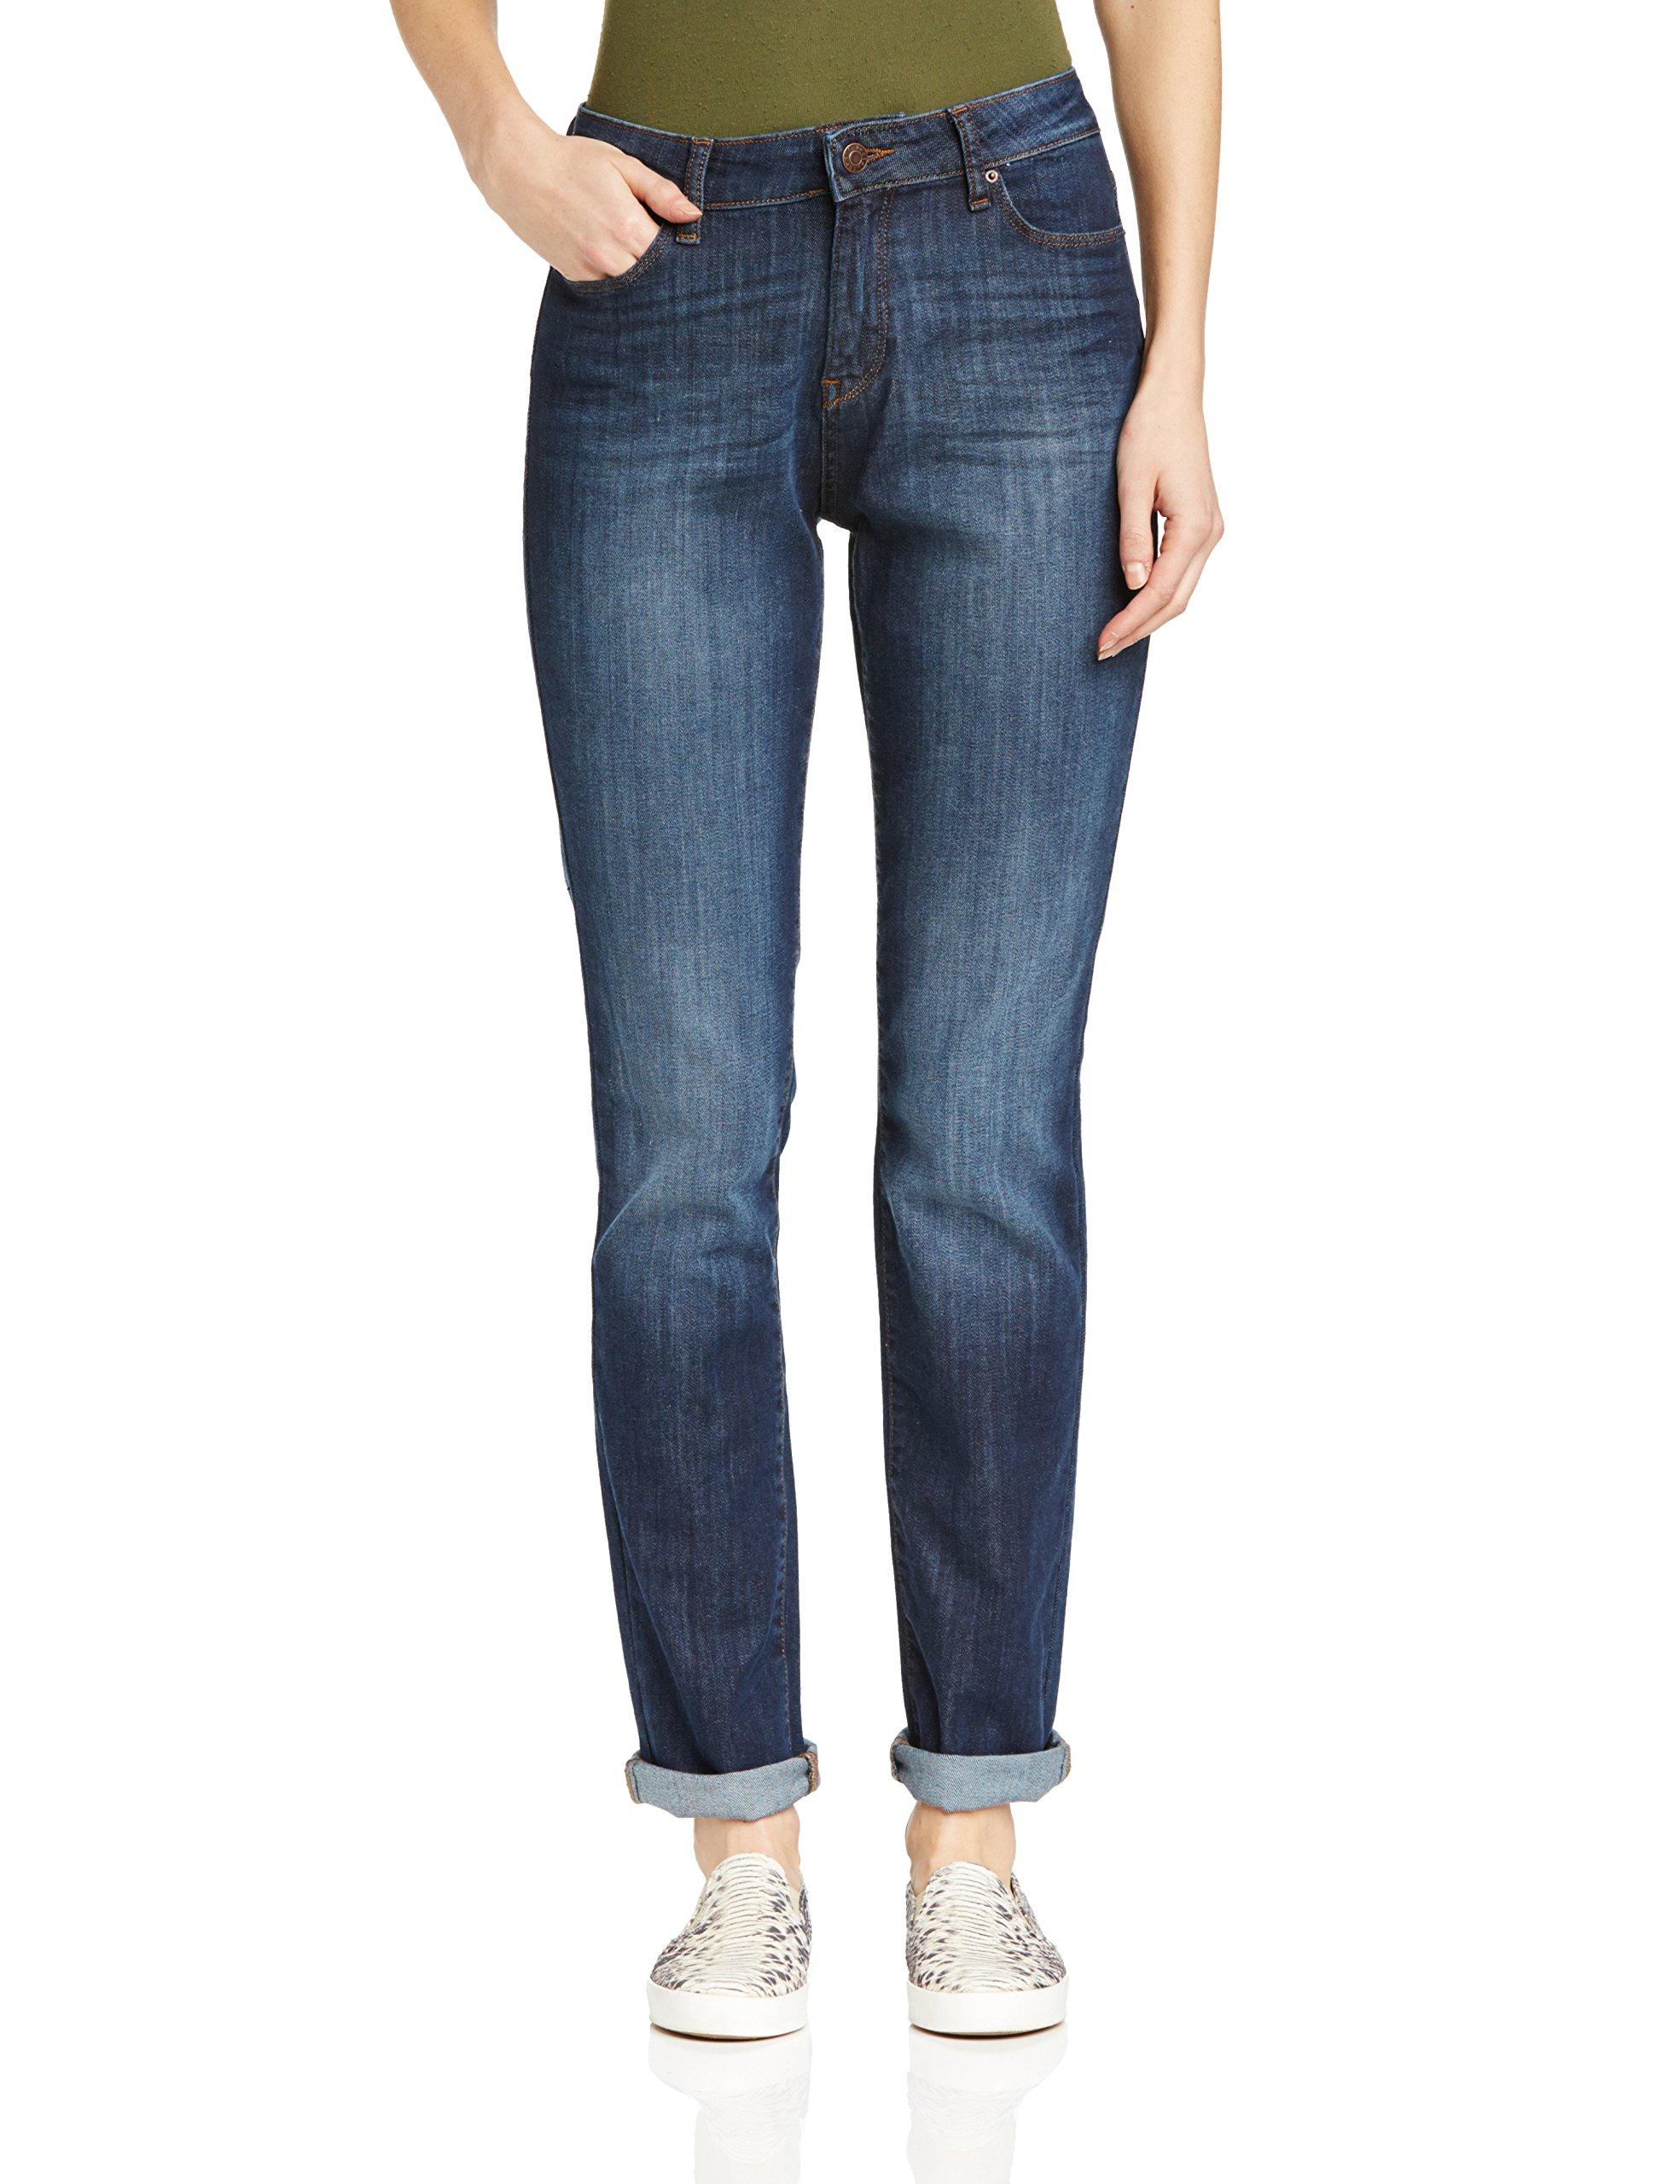 Oceantaille JeansBleudeep Esprit FabricantW28 l32Femme 994ee1b927 R435AjLq